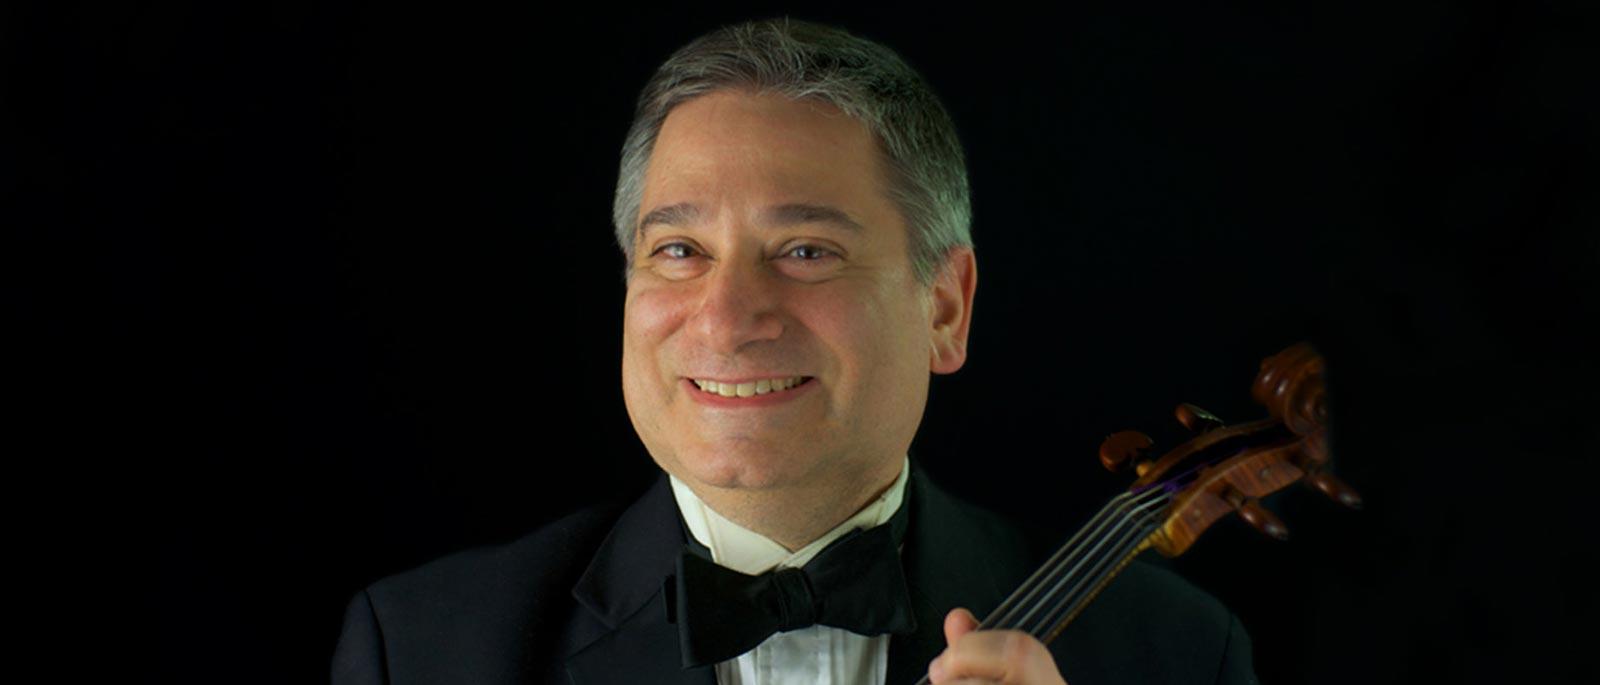 Винсент Лионти. Фото - сайт Metropolitan Opera